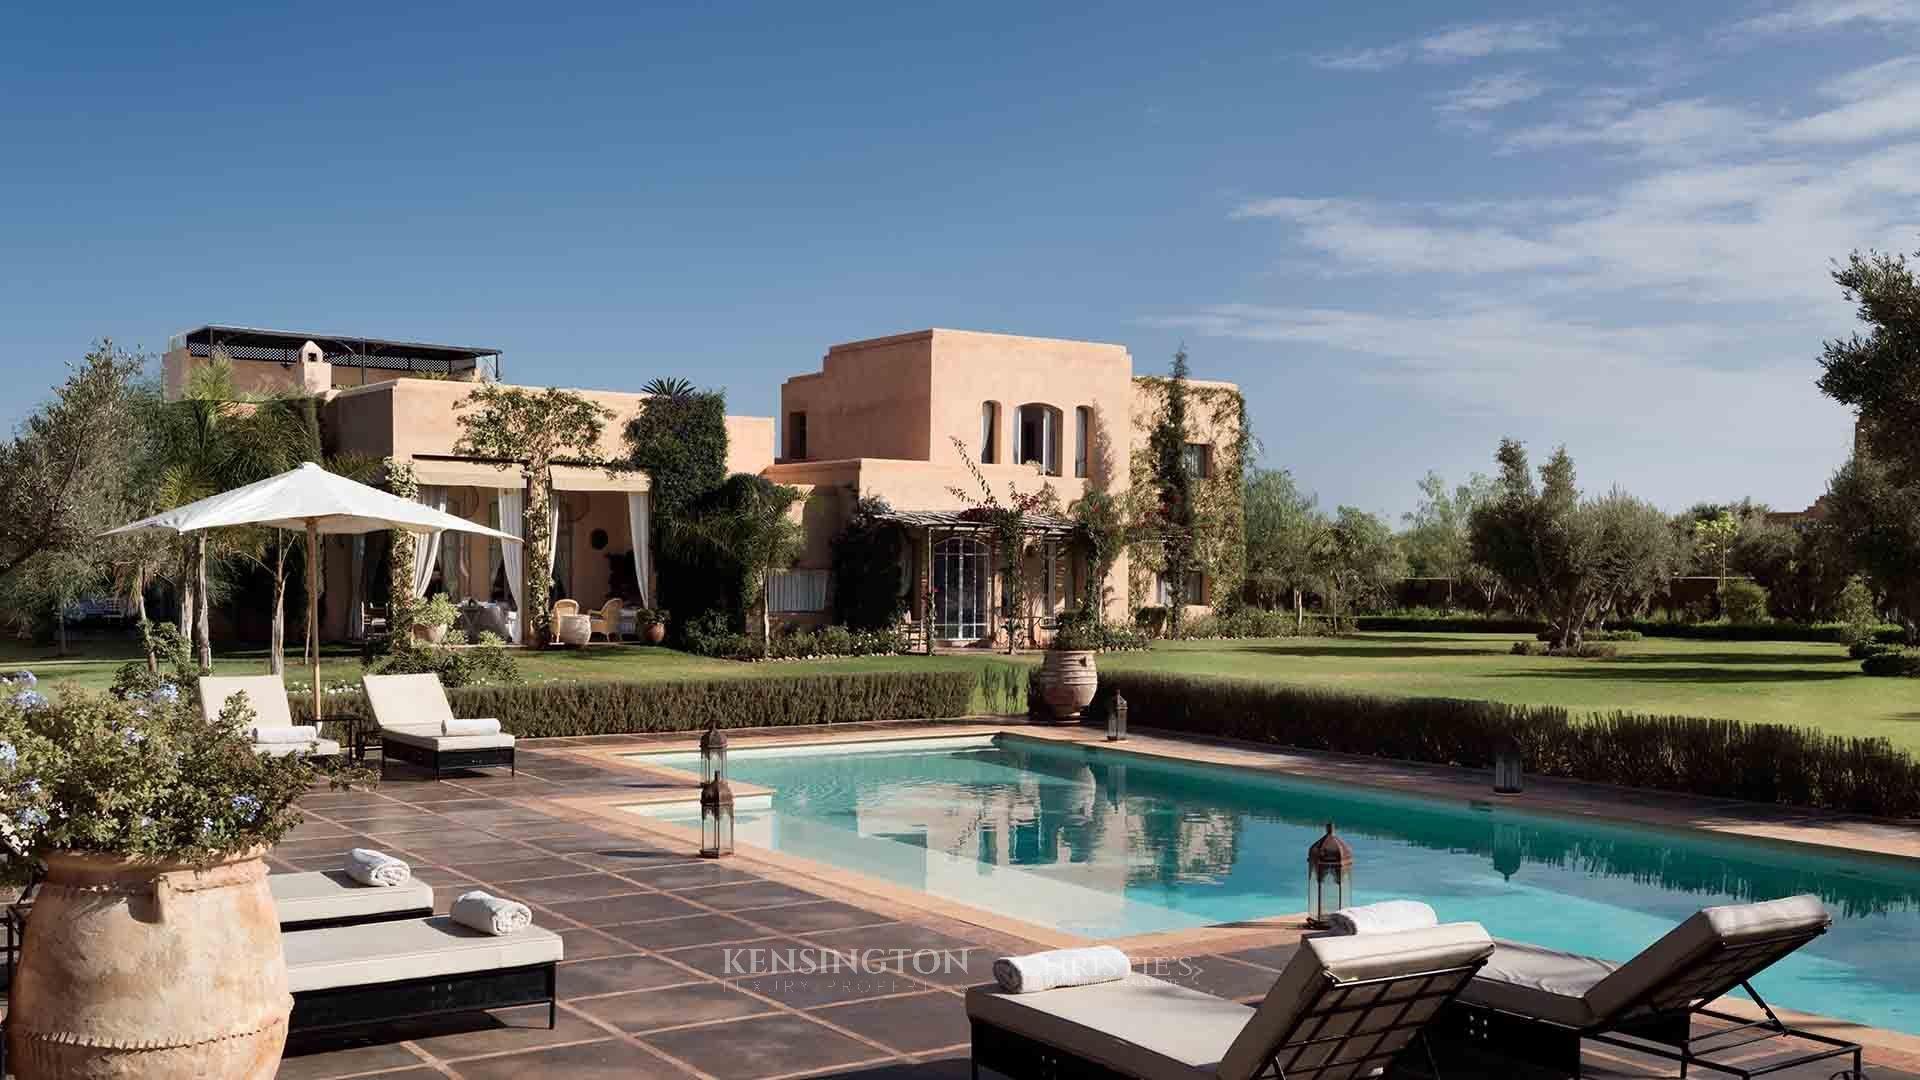 KPPM01051: Villa Adara Luxury Villa Marrakech Morocco